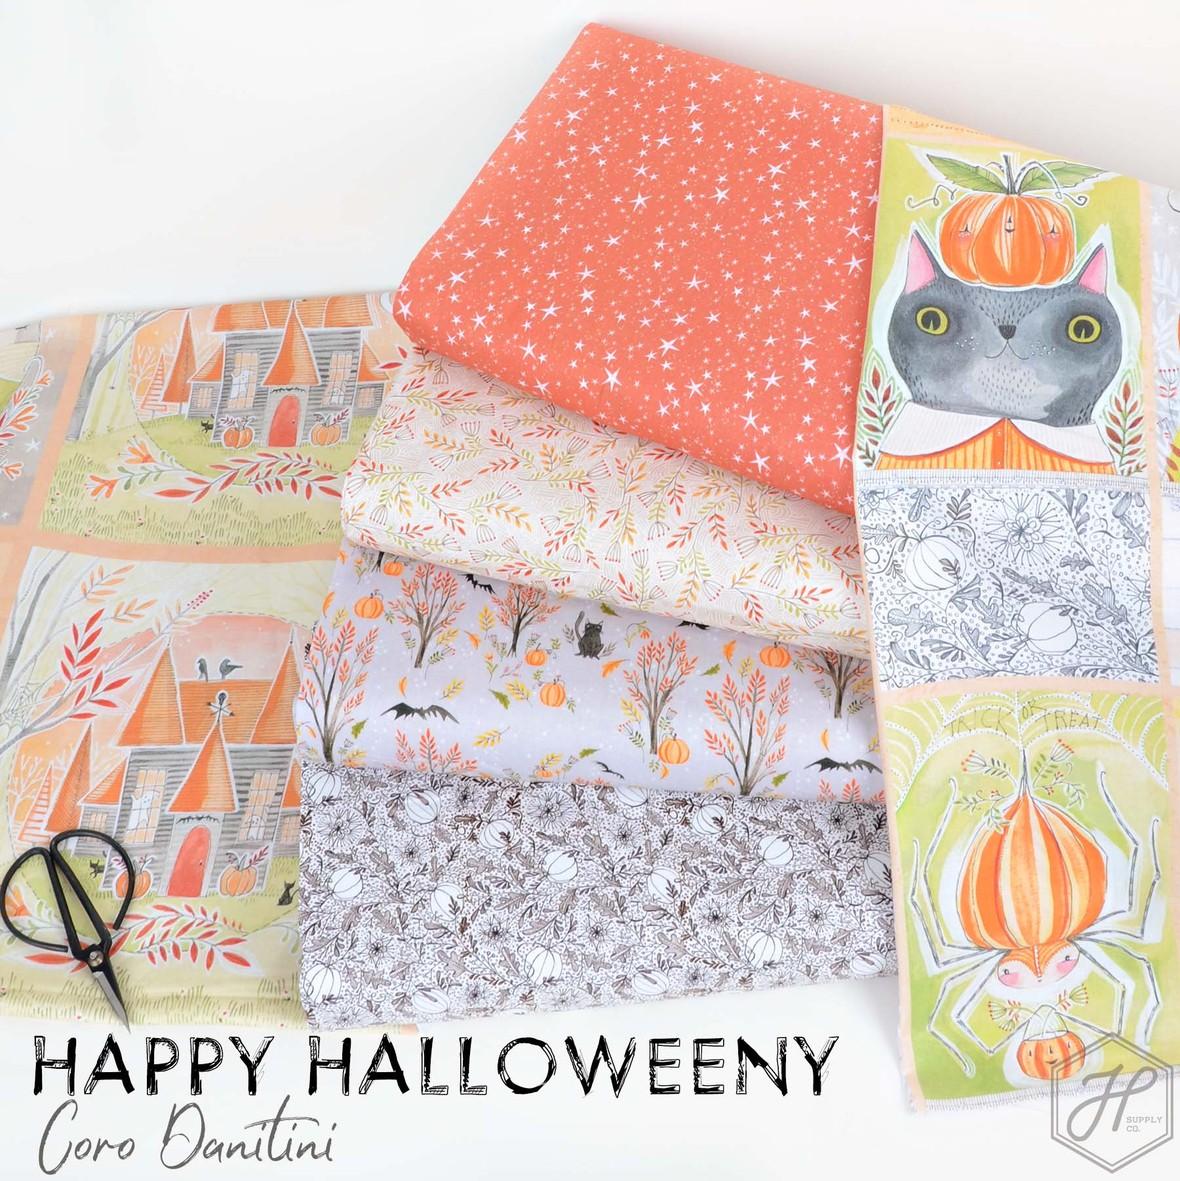 Happy Halloweeny Fabric Cori Dantini for Blend at Hawthorne Supply Co